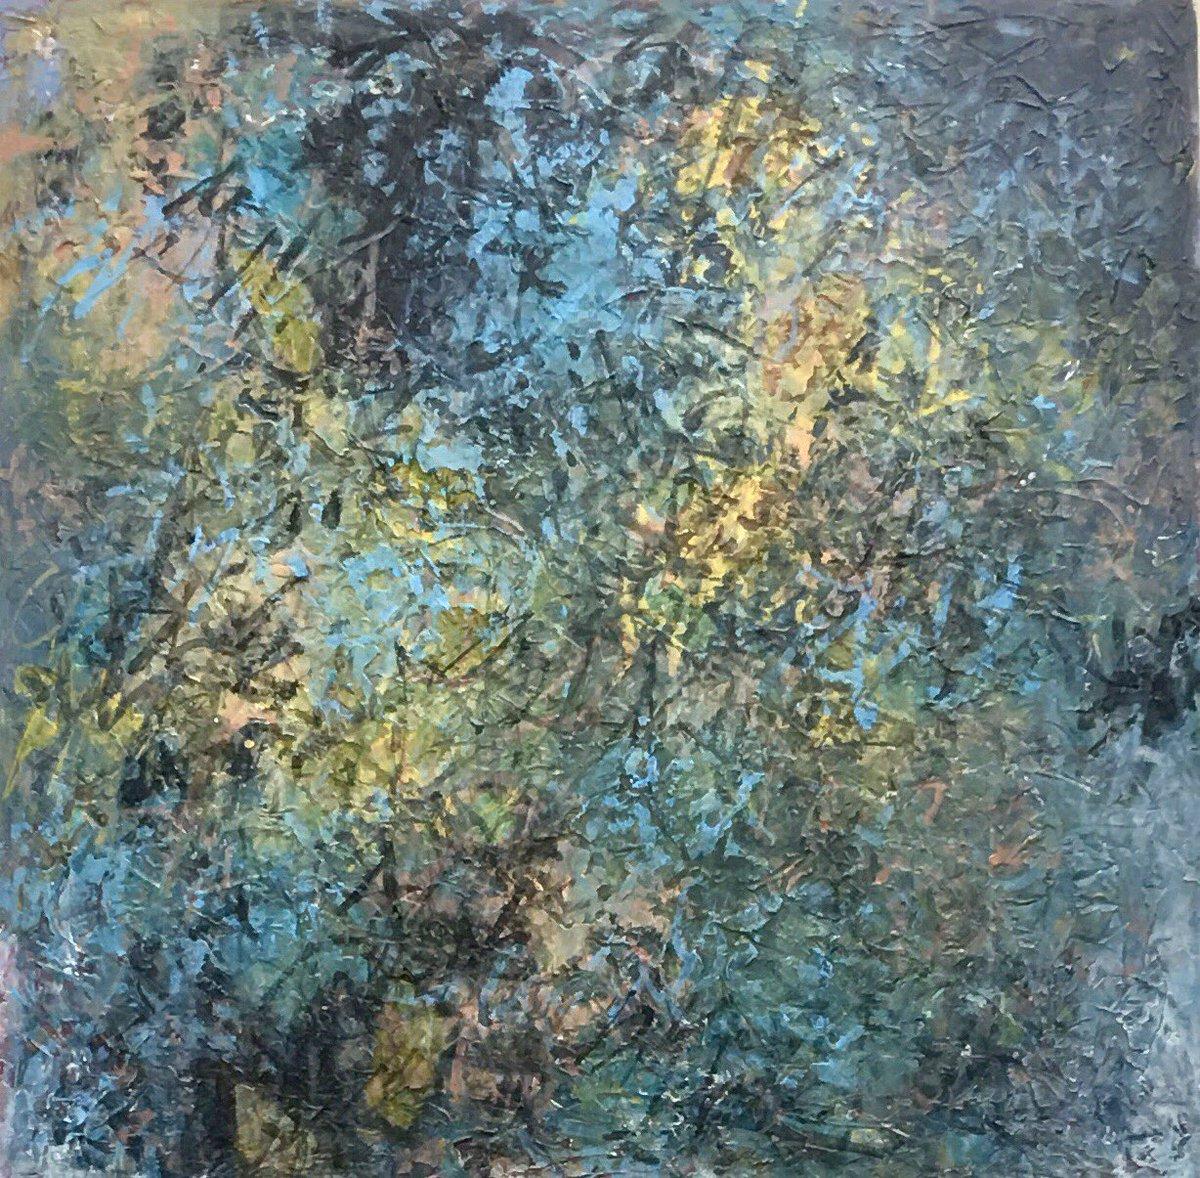 'Shrinkage and Relaxation of Consciousness', 70cm square acrylic on wood panel #art #artwork #painting #abstractart #contemporaryart #modernart #originalart #artist #painter #fineart #interiordesign #interiordecor #artcollector #myart #artoftheday #artistsontwitter